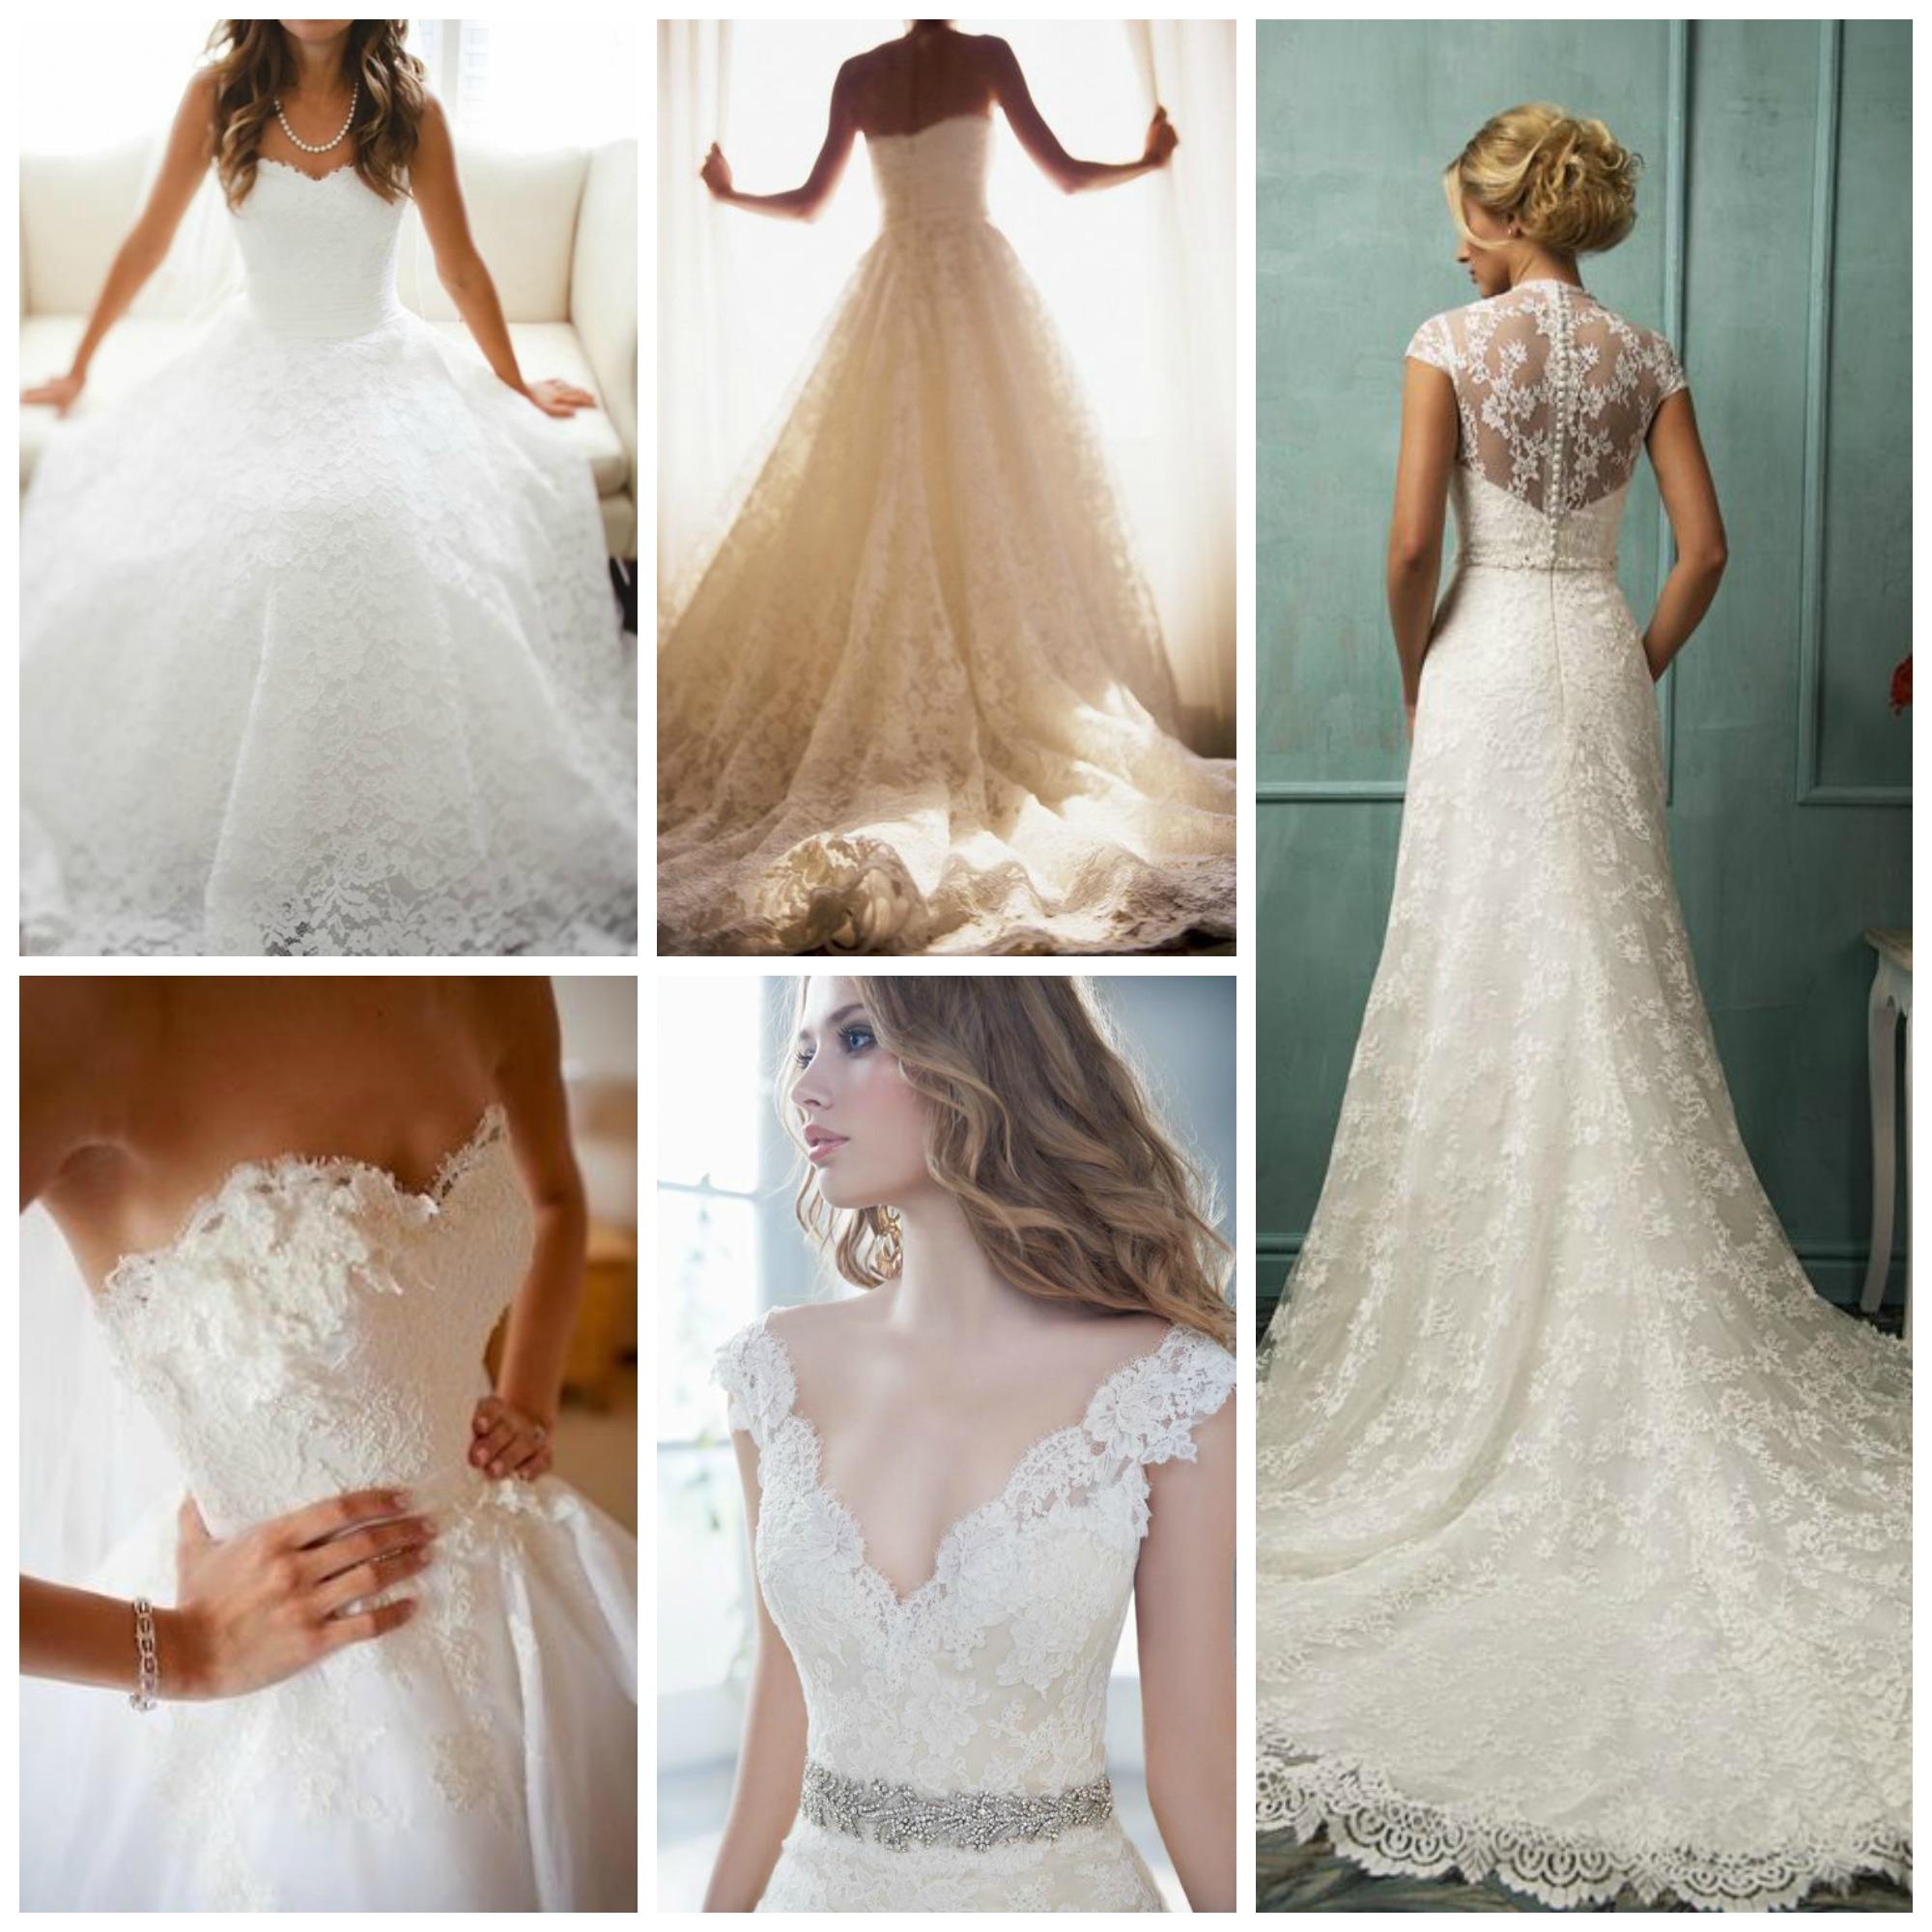 wedding dresses | Bellaboo and Beau